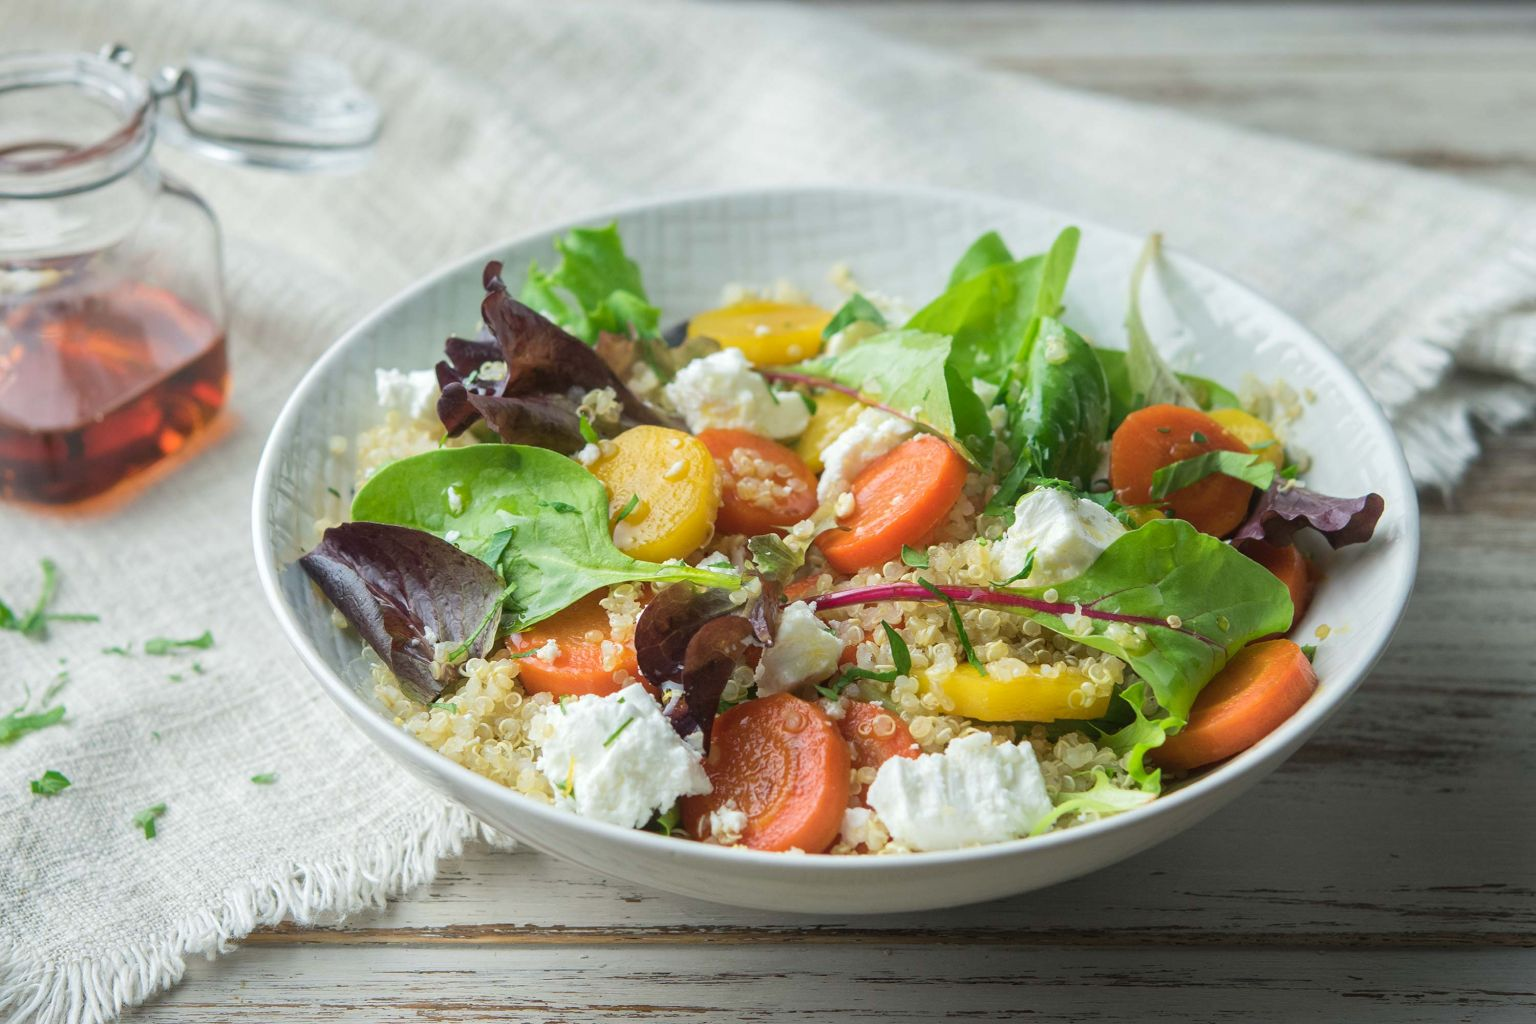 Recette_salade_carottes_glacées_sirop_érable_fromage grec